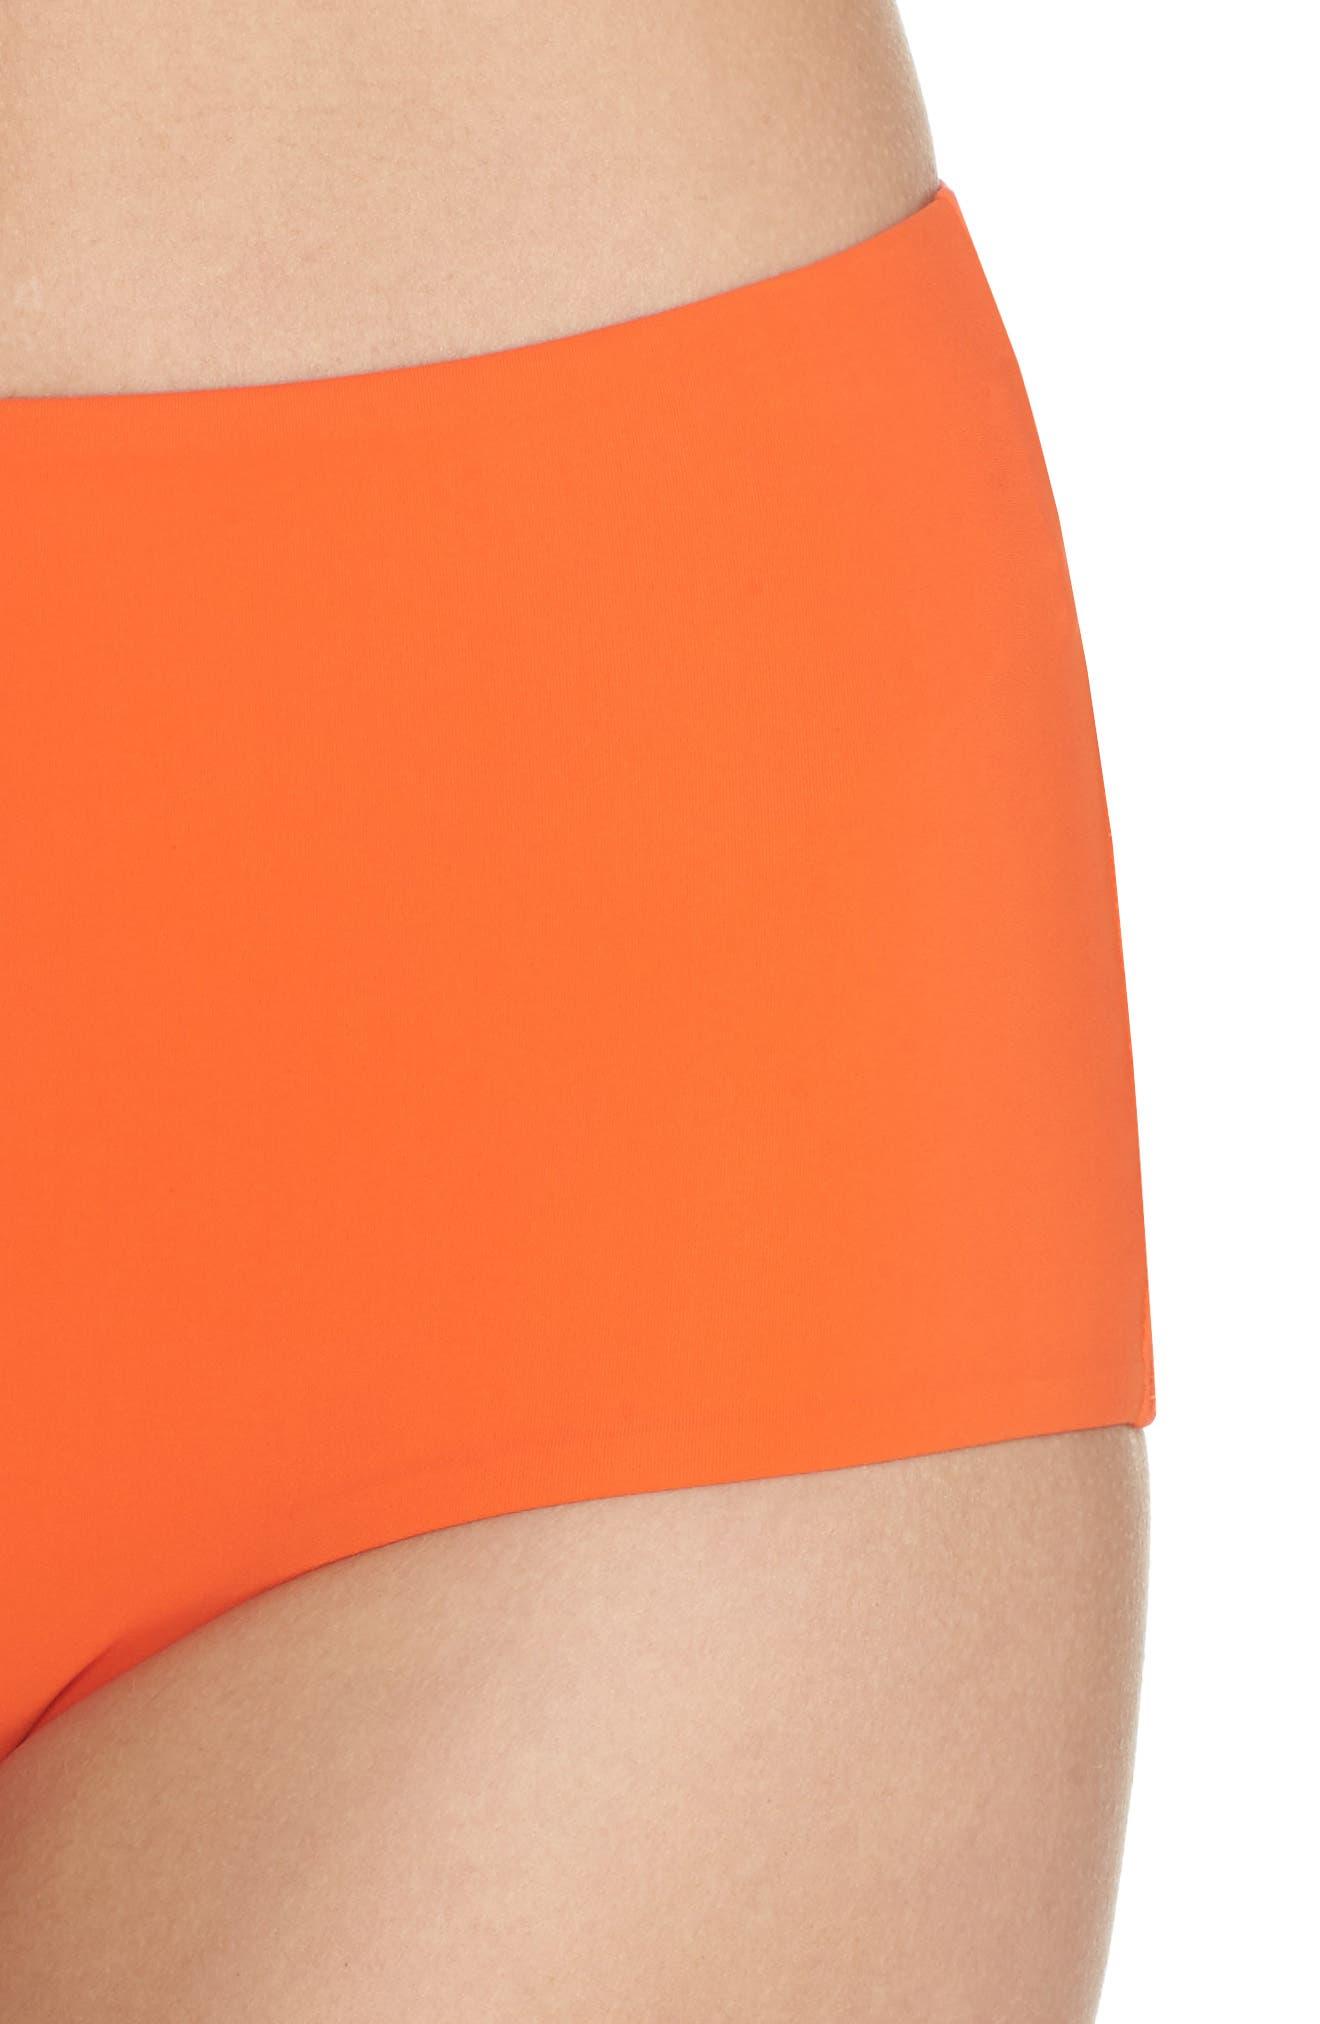 Marina High Waist Bikini Bottoms,                             Alternate thumbnail 4, color,                             Sweet Tangerine